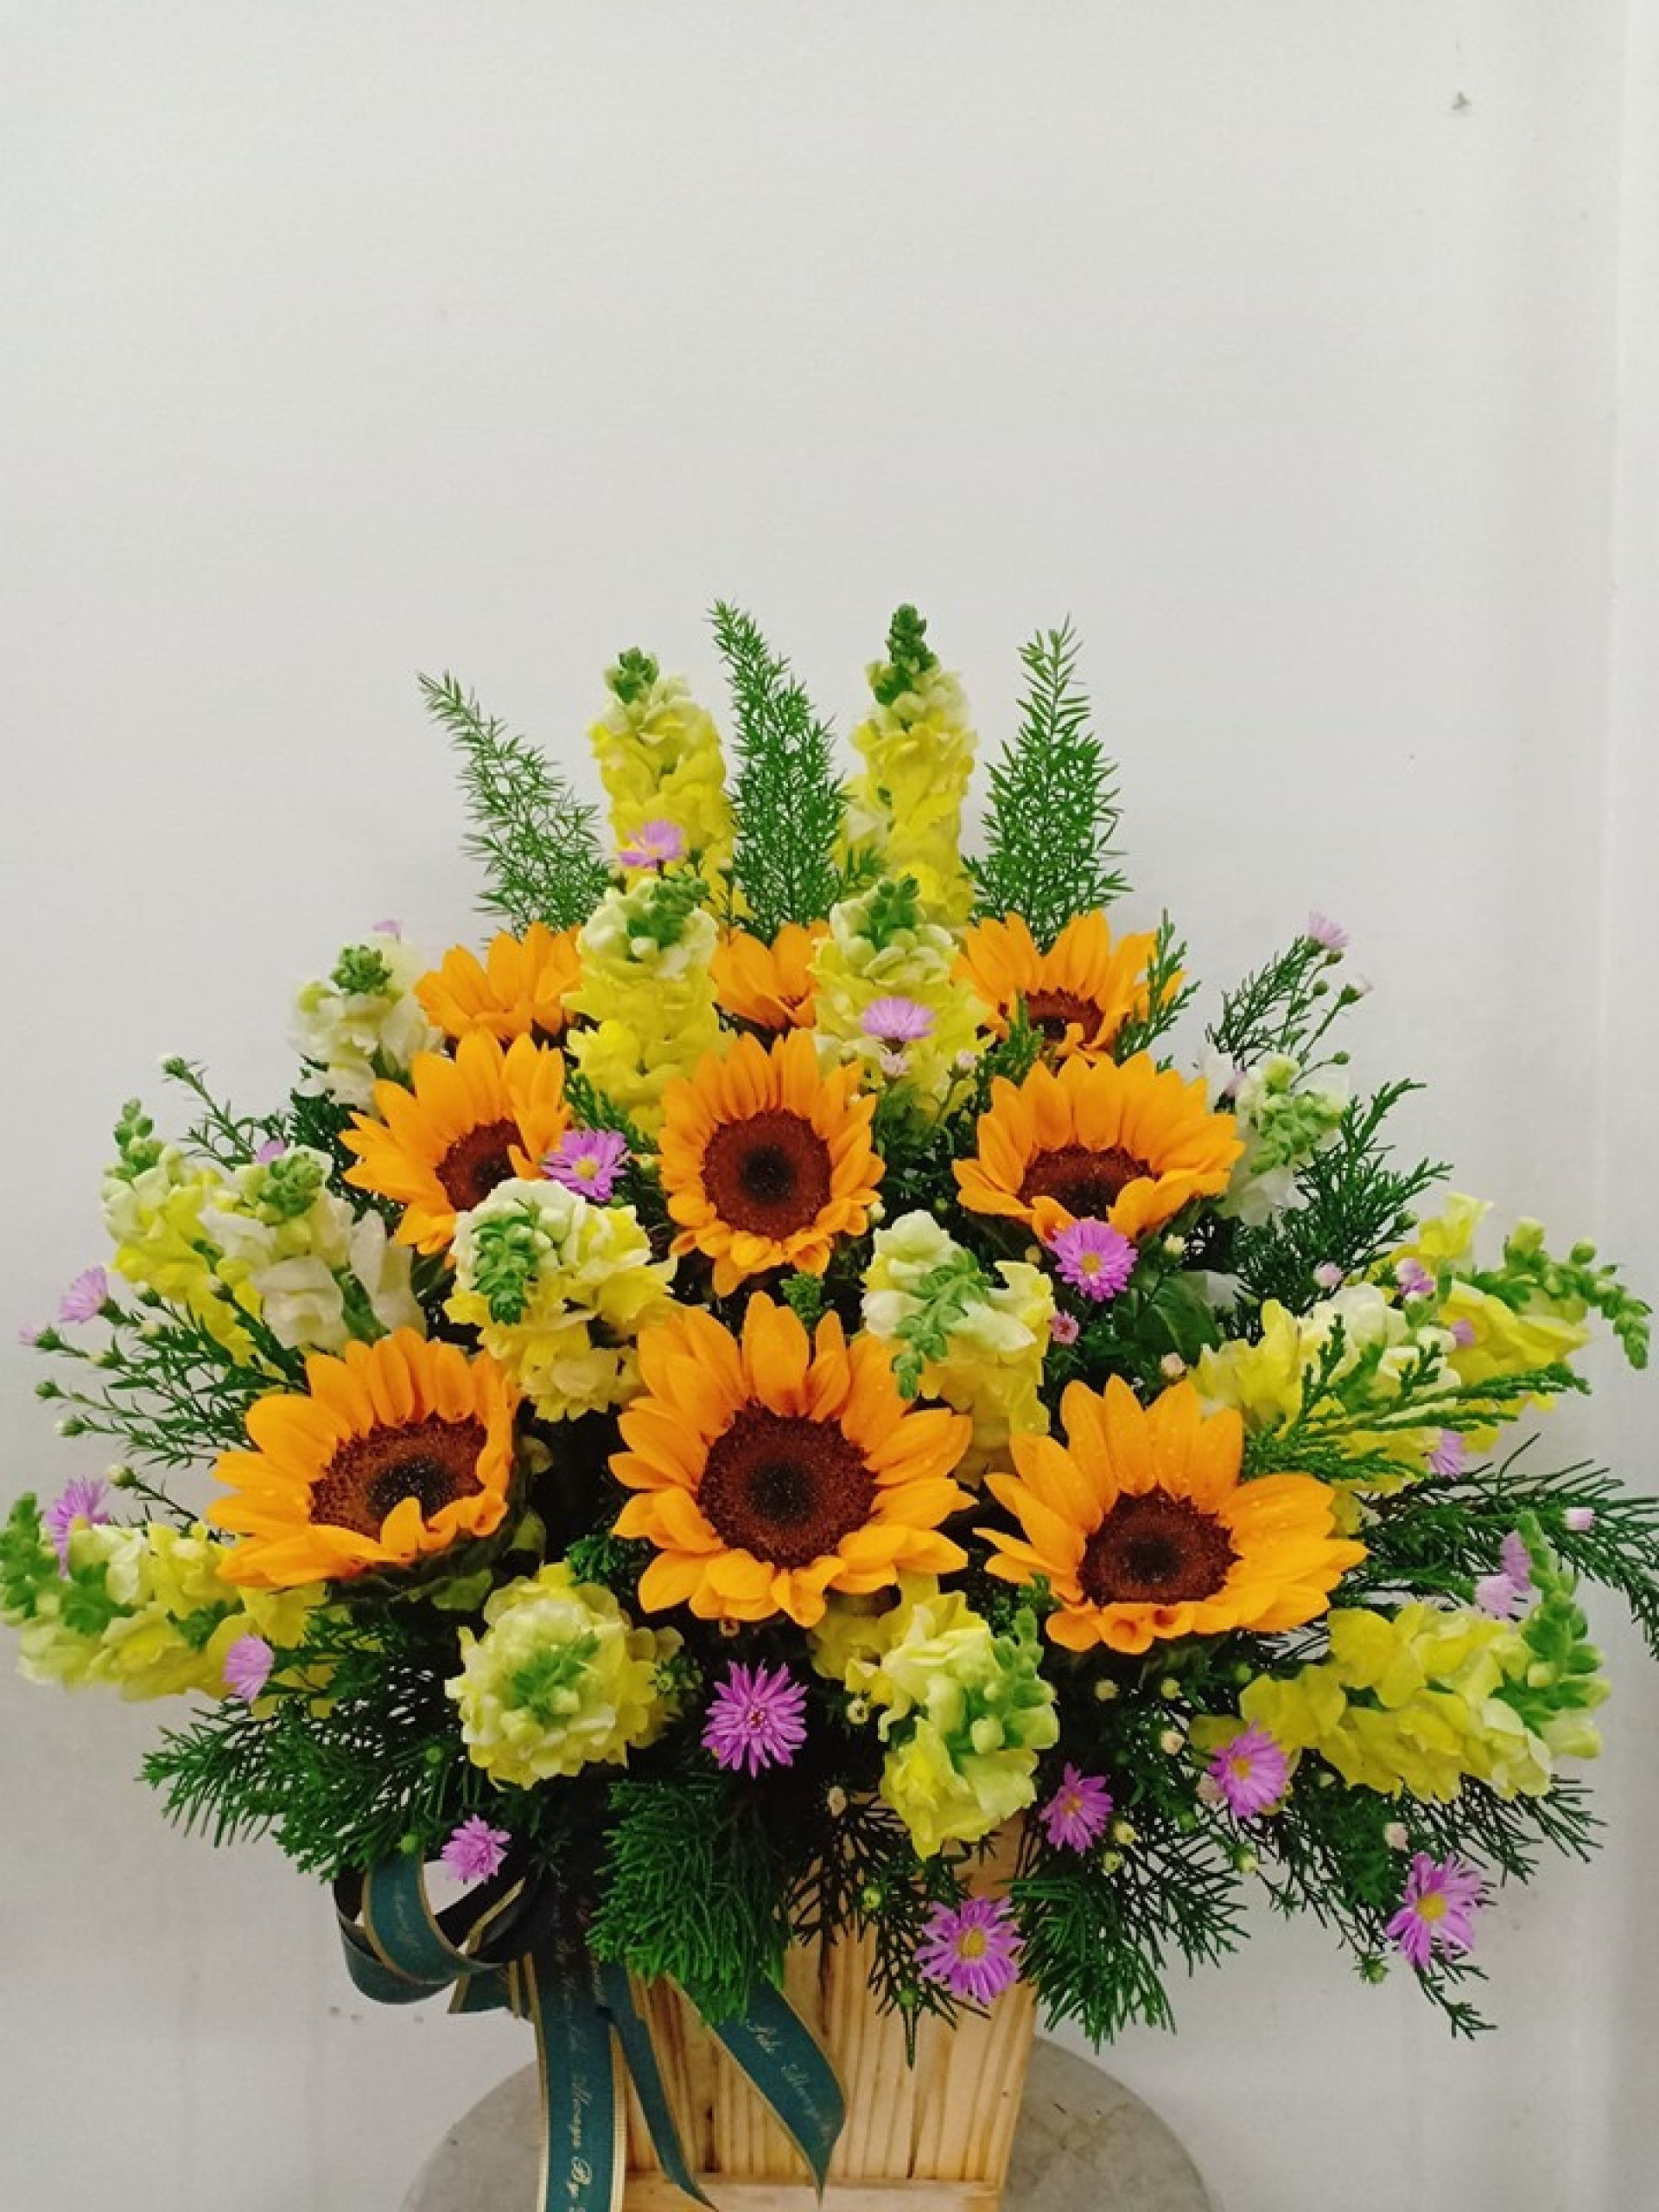 Hoa đẹp tặng phụ nữ